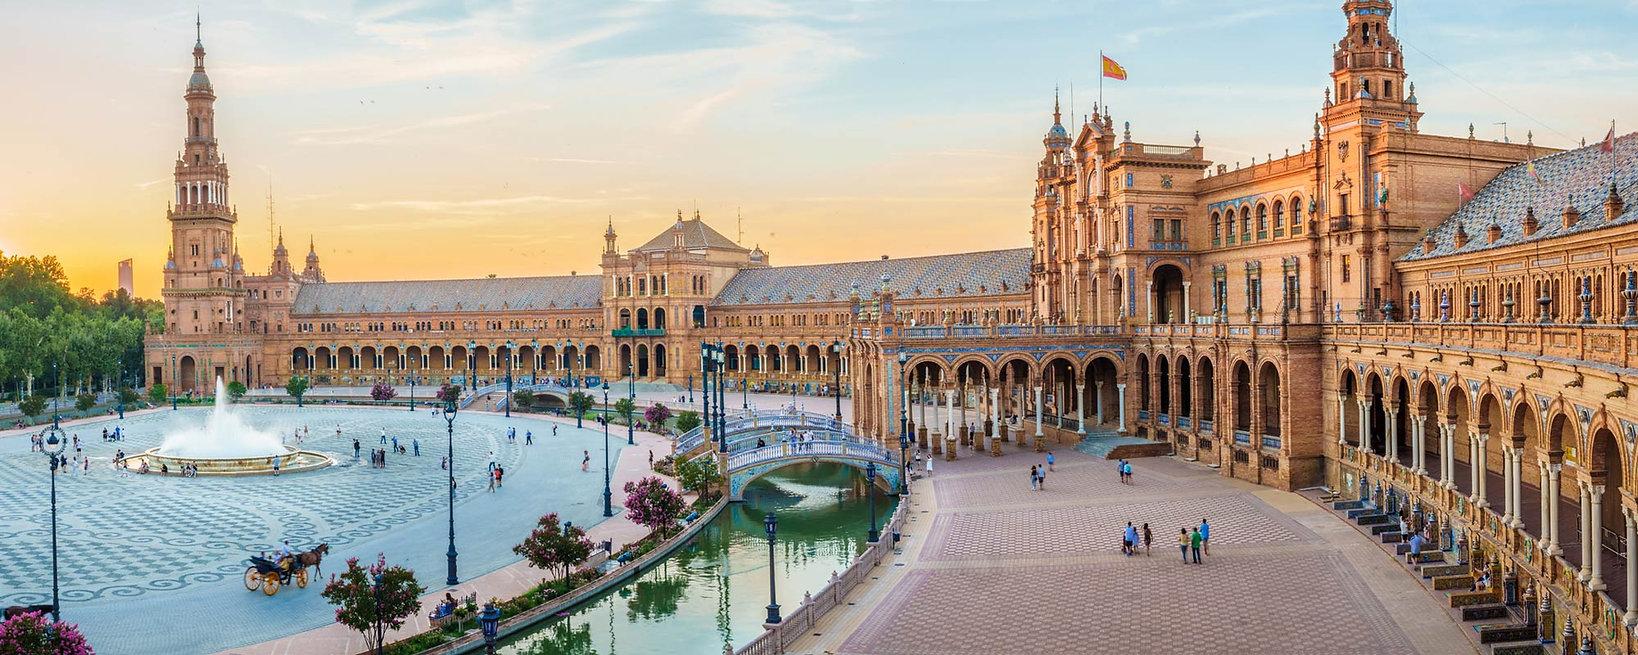 The-Plaza-Espana.jpg